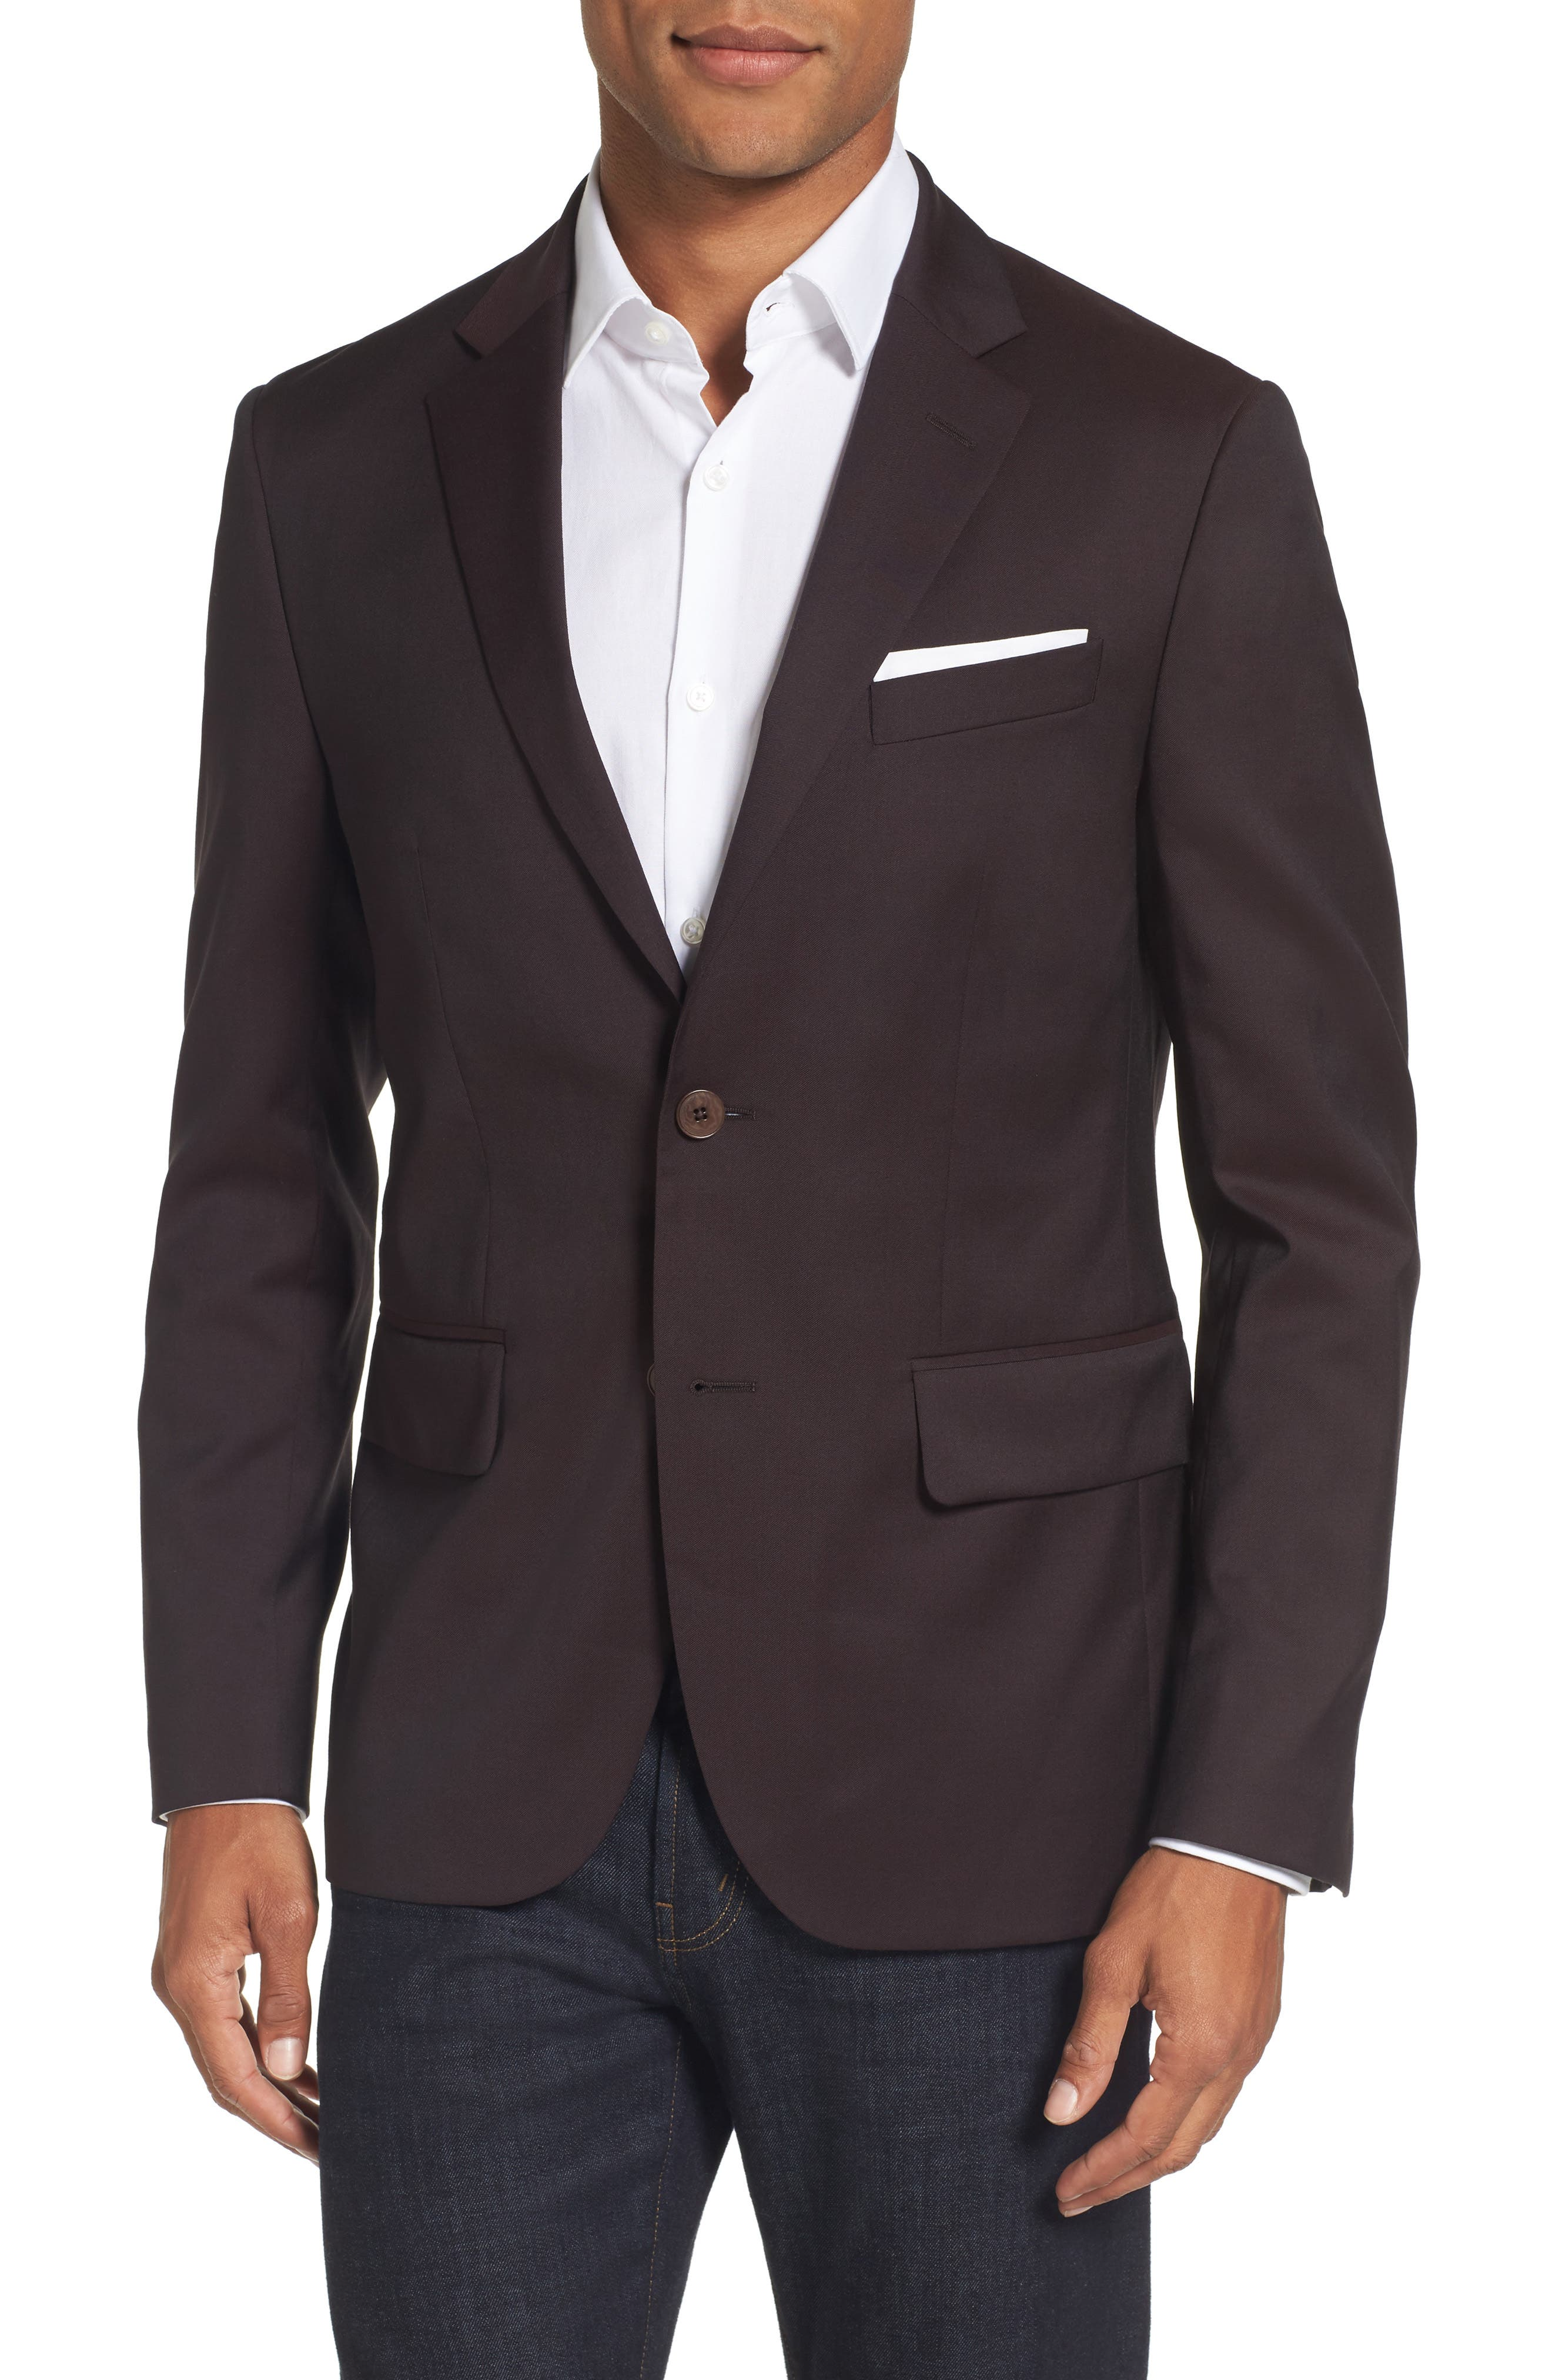 Gant Travel Suit Jacket